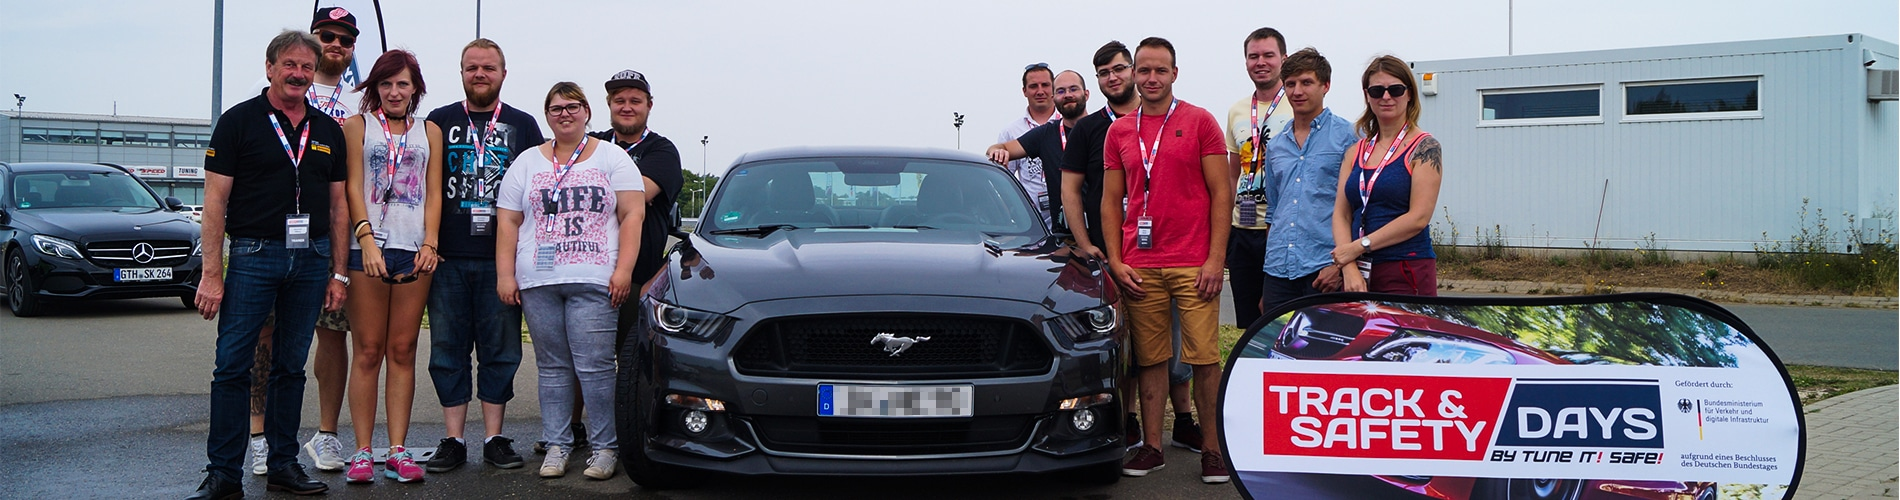 Teilnehmer der Track and Safety Days mit Ford Mustang